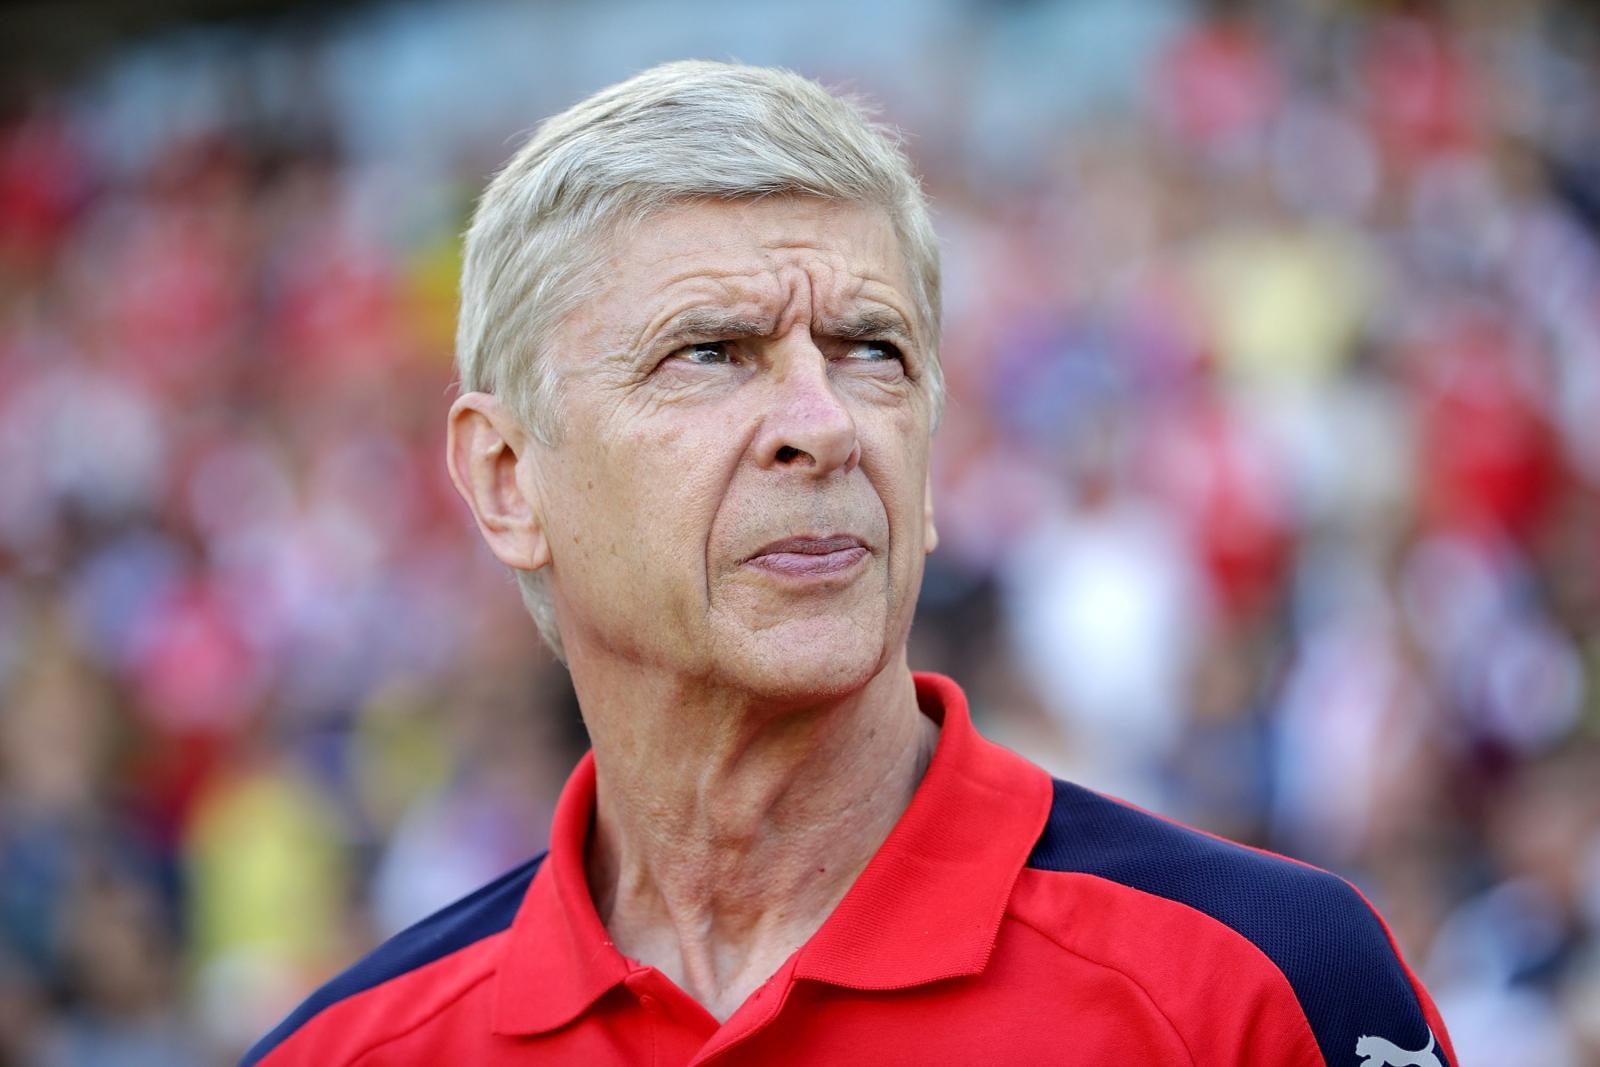 Arsenal Premier League 2016-17 preview: Arsene Wenger treading water ahead of 20th season